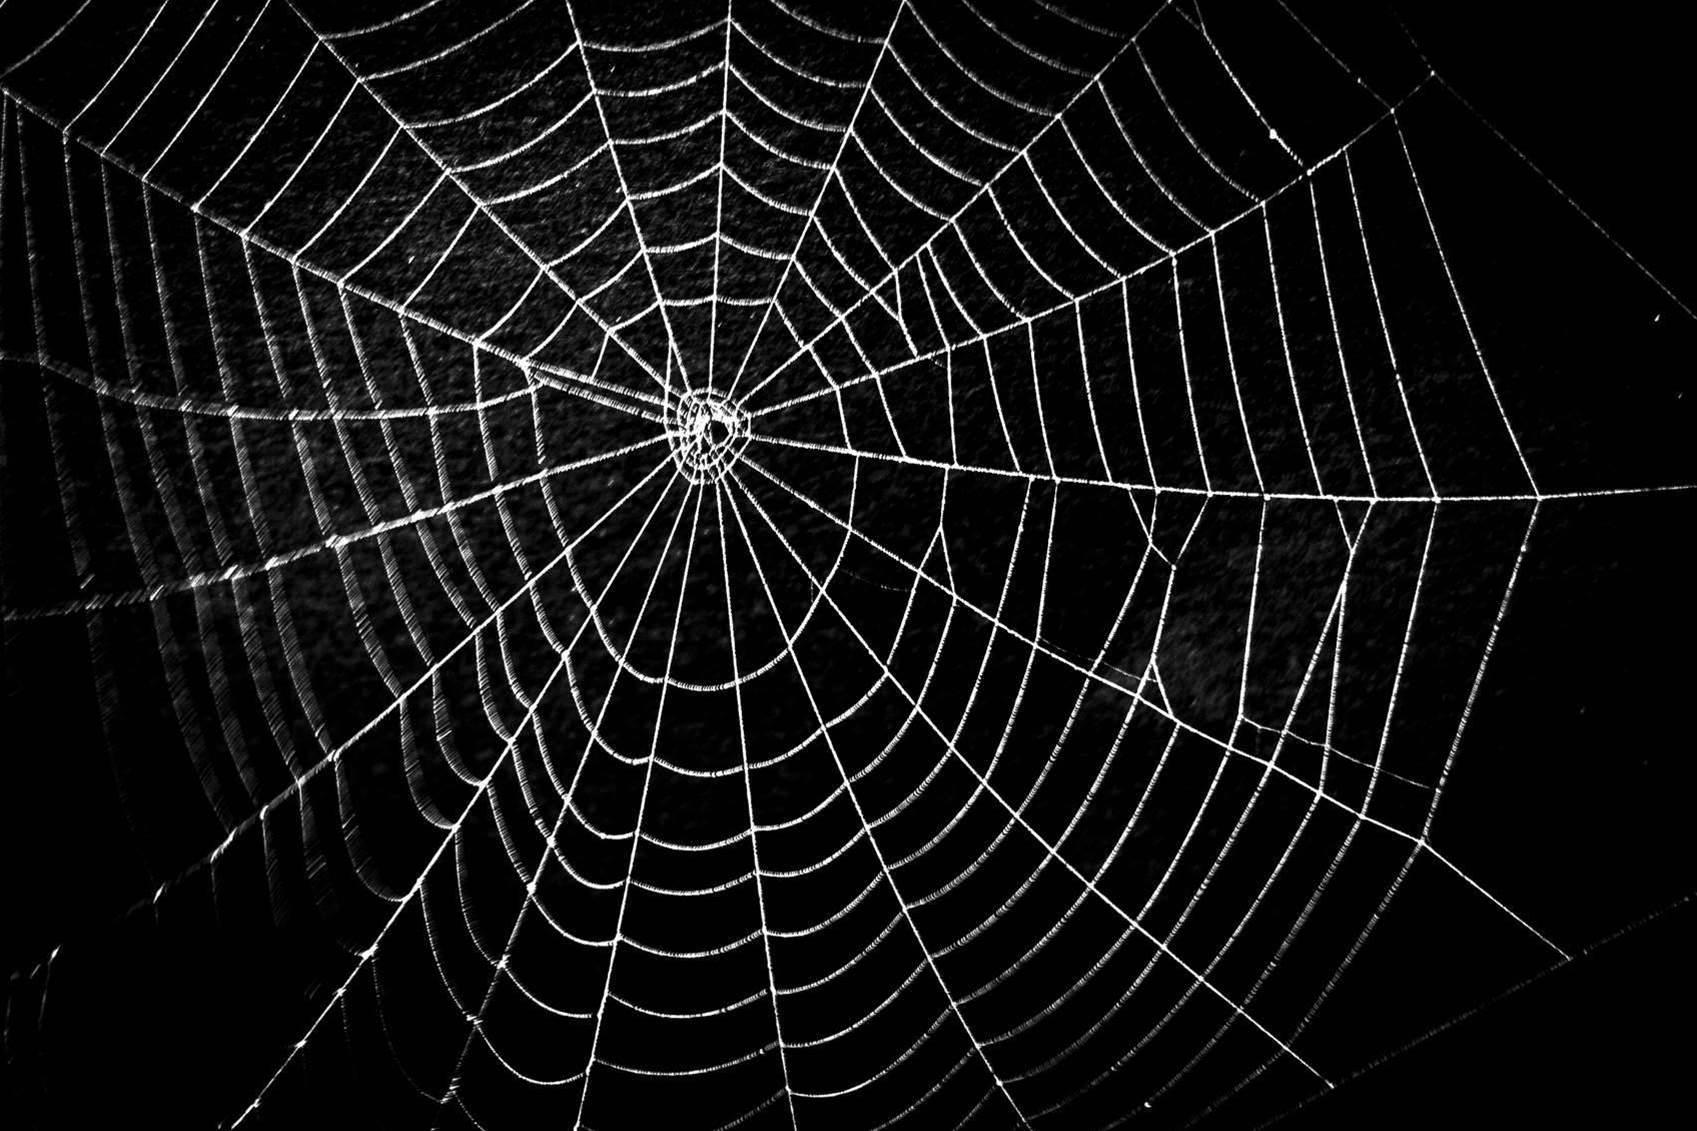 Energy Australia's 'spiderweb' systems problem